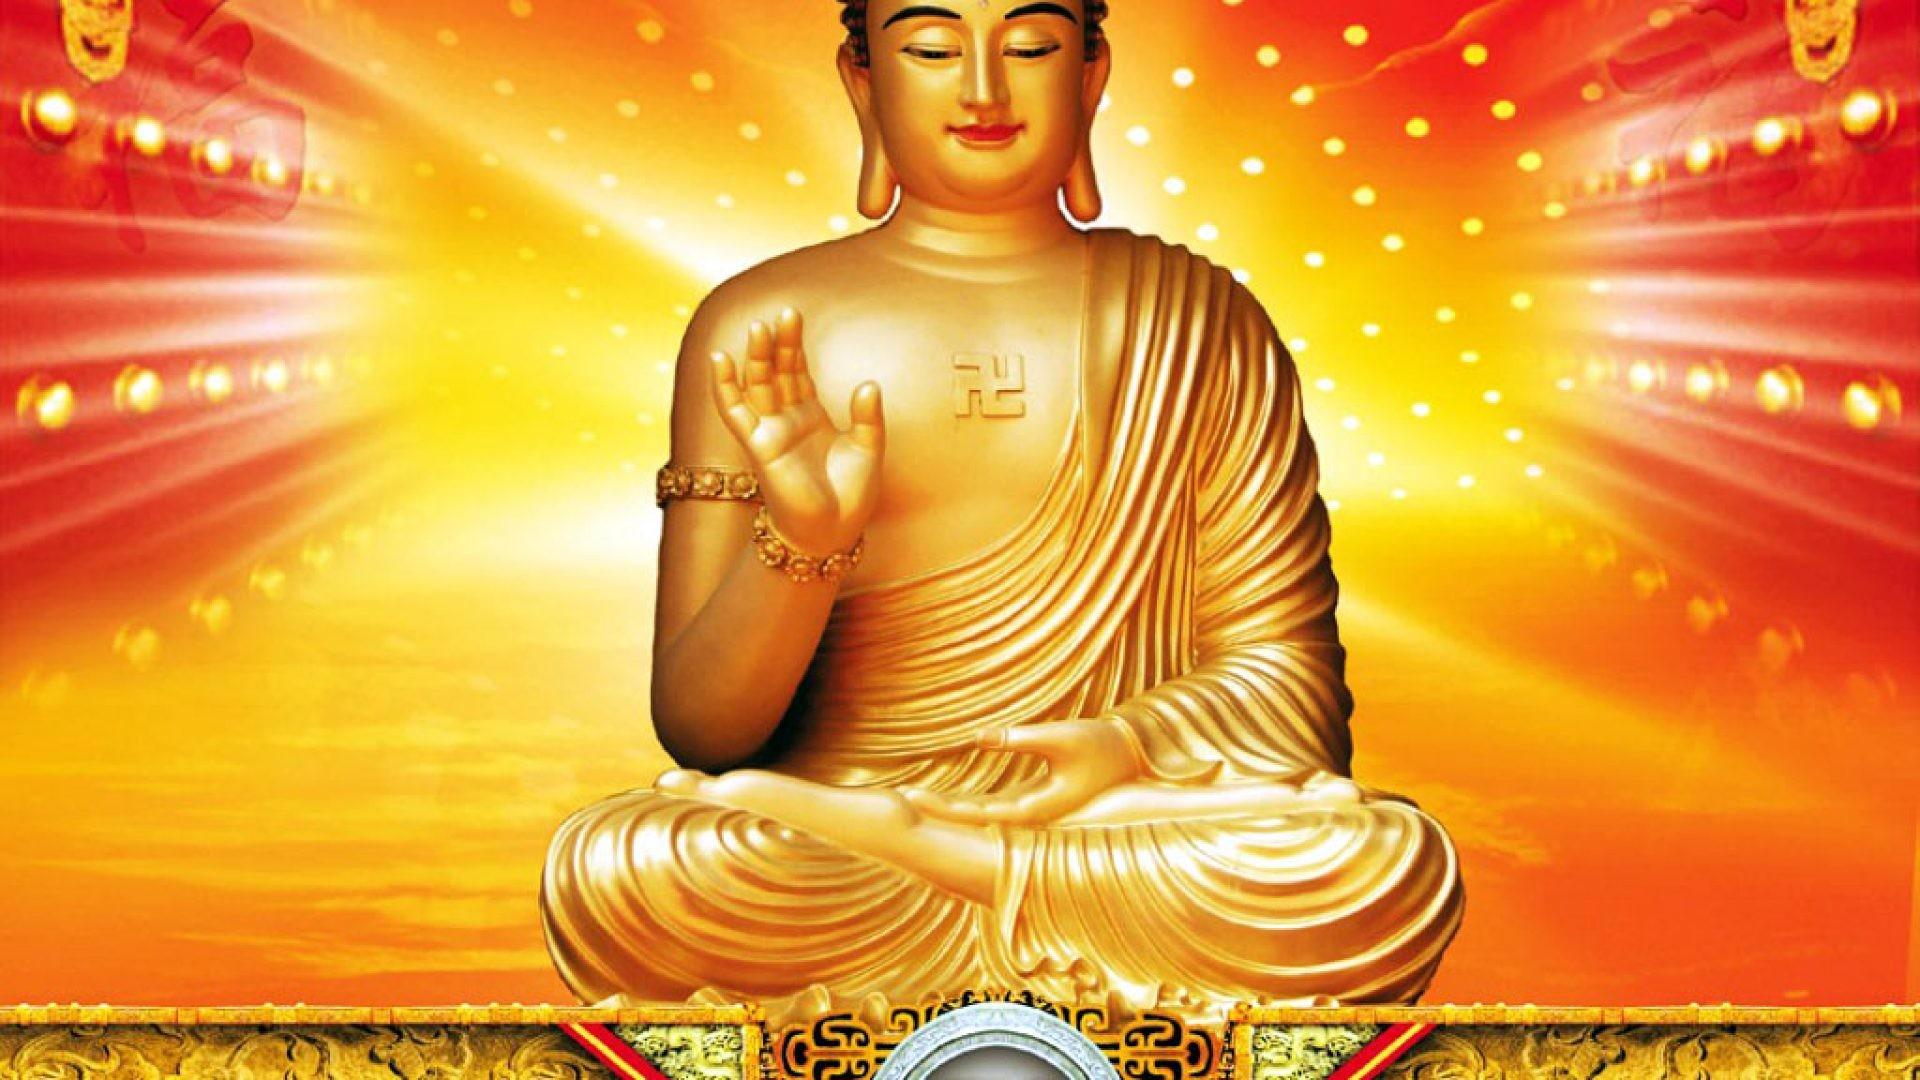 Gautam Buddha Full Hd Wallpapers: Buddha Wallpaper 1920x1080 (79+ Images